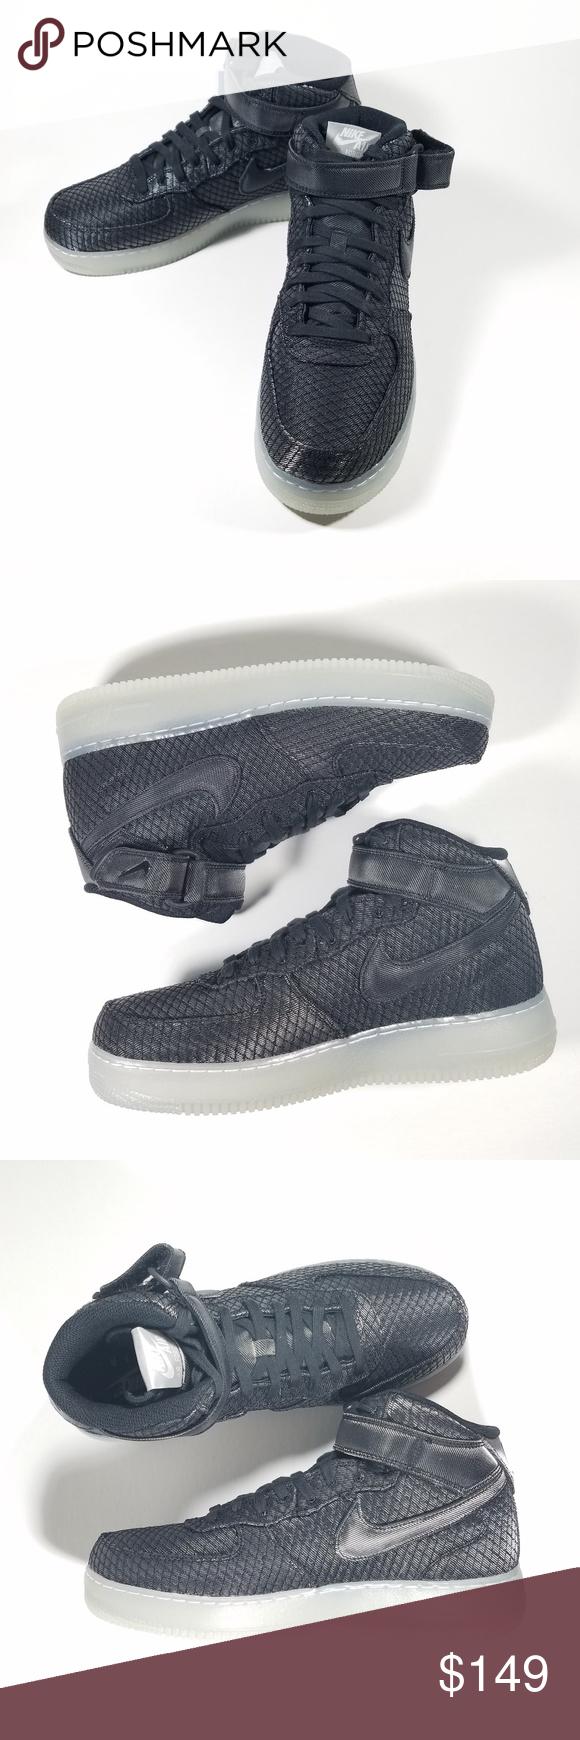 best service b2c64 30d41 Nike Air Force 1 Sz 9 Mid  07 804609-005 Black Nike Air Force 1 Mid  07 LV8  Mens 804609-005 Black Silver White Shoes Size 9 Nike Air Force 1 Mid  07 LV8  ...